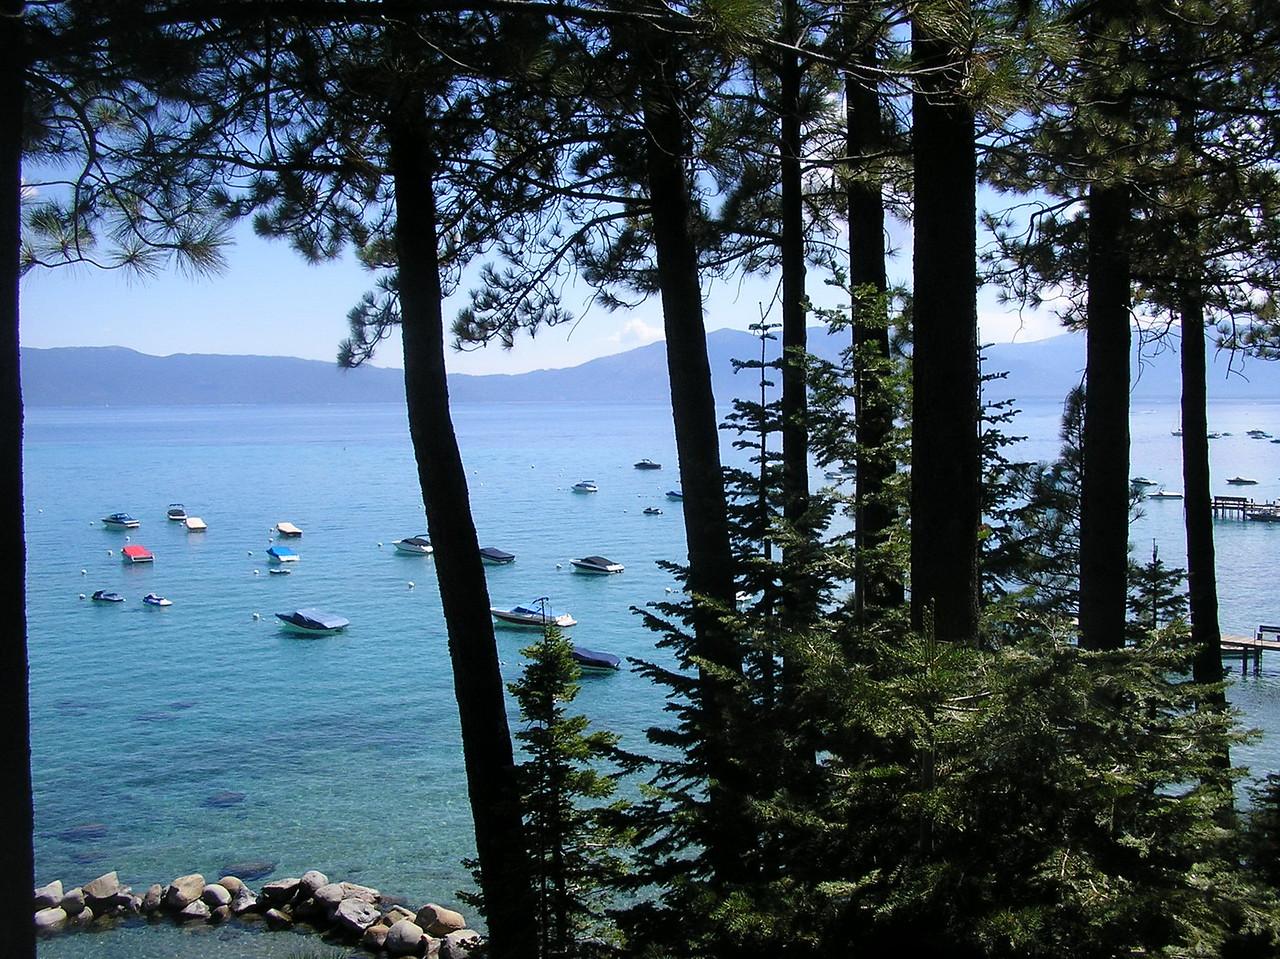 Southern View of Lake Tahoe